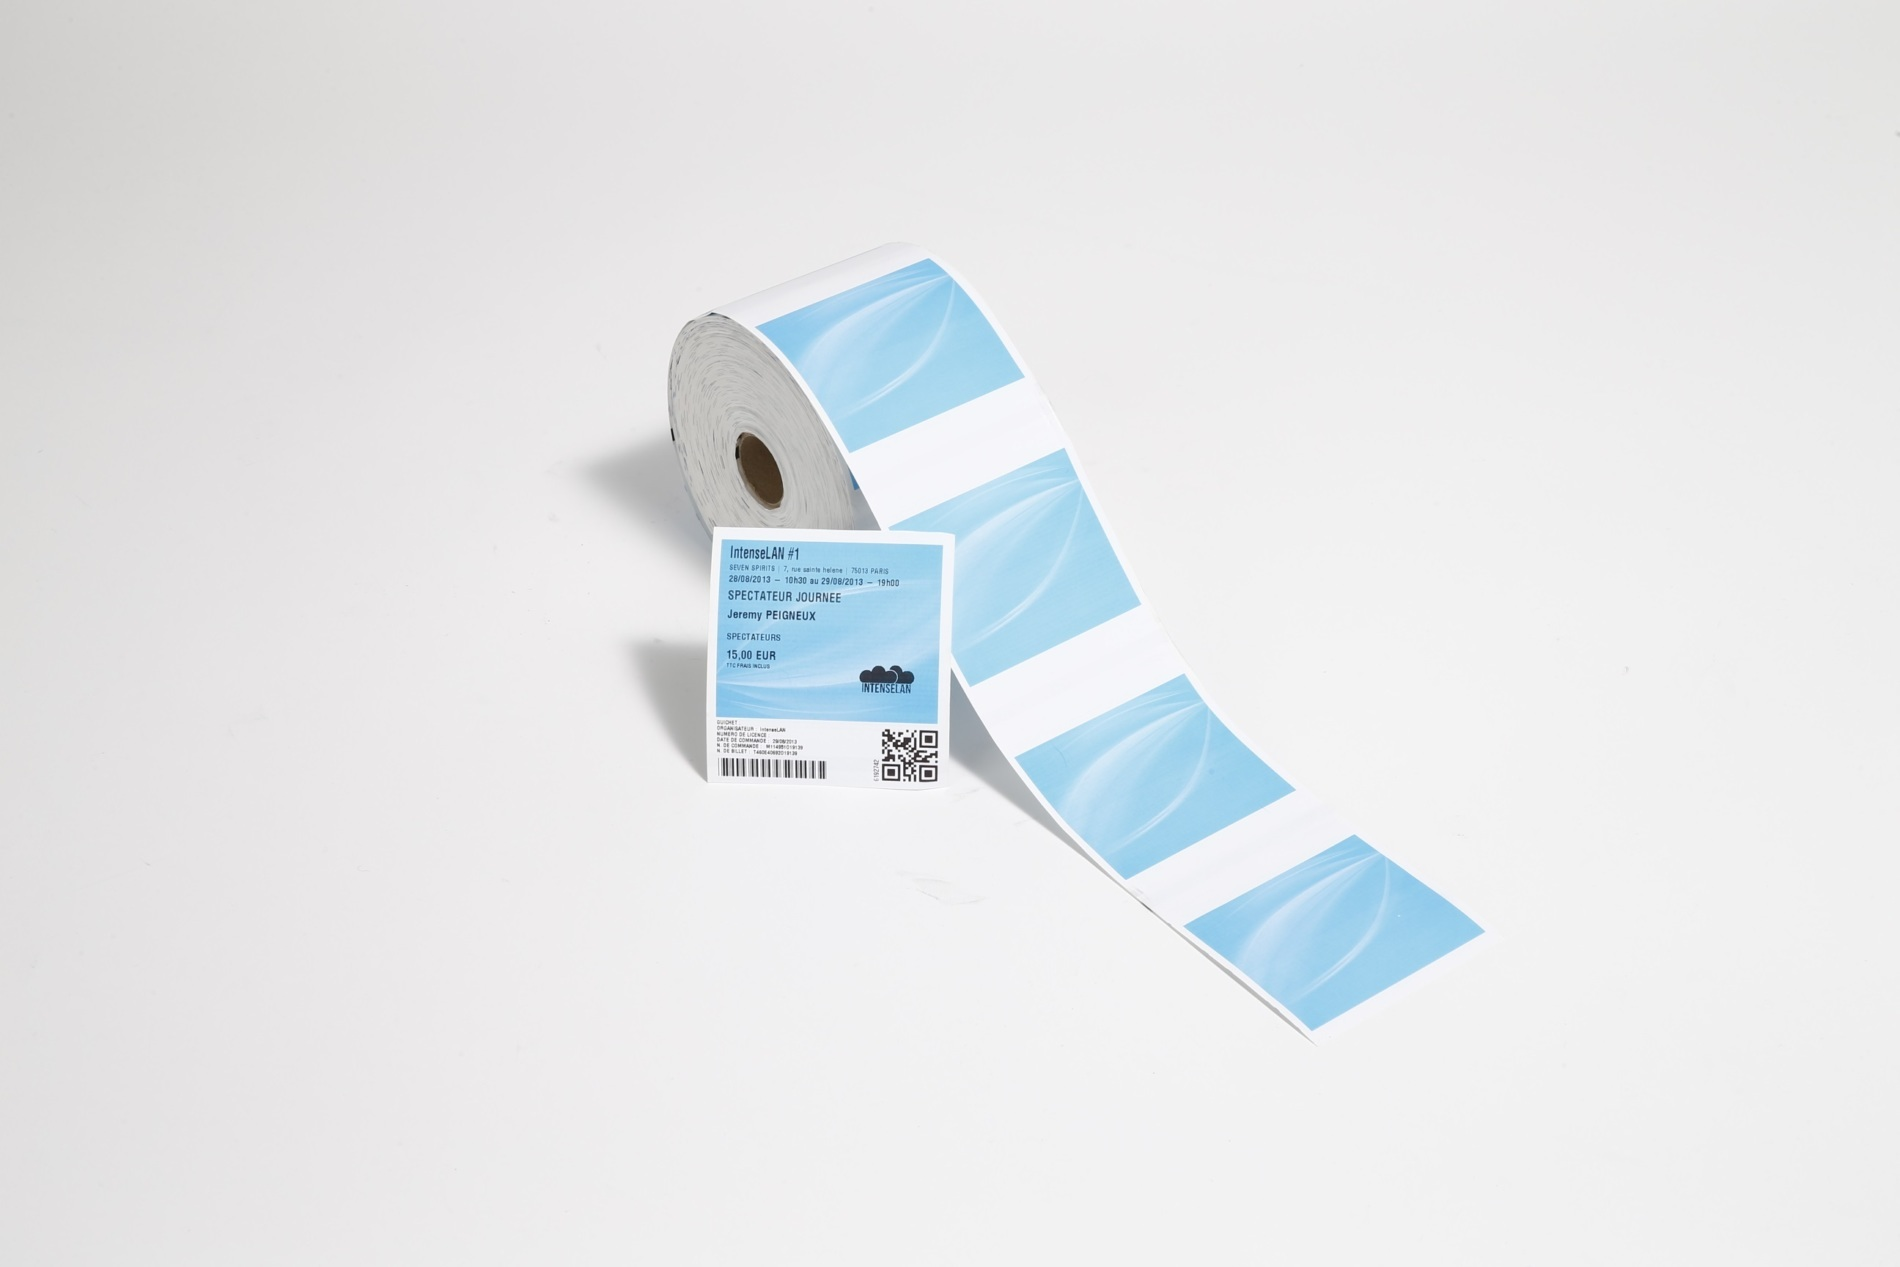 weezevent-m7t3569-1900x1267